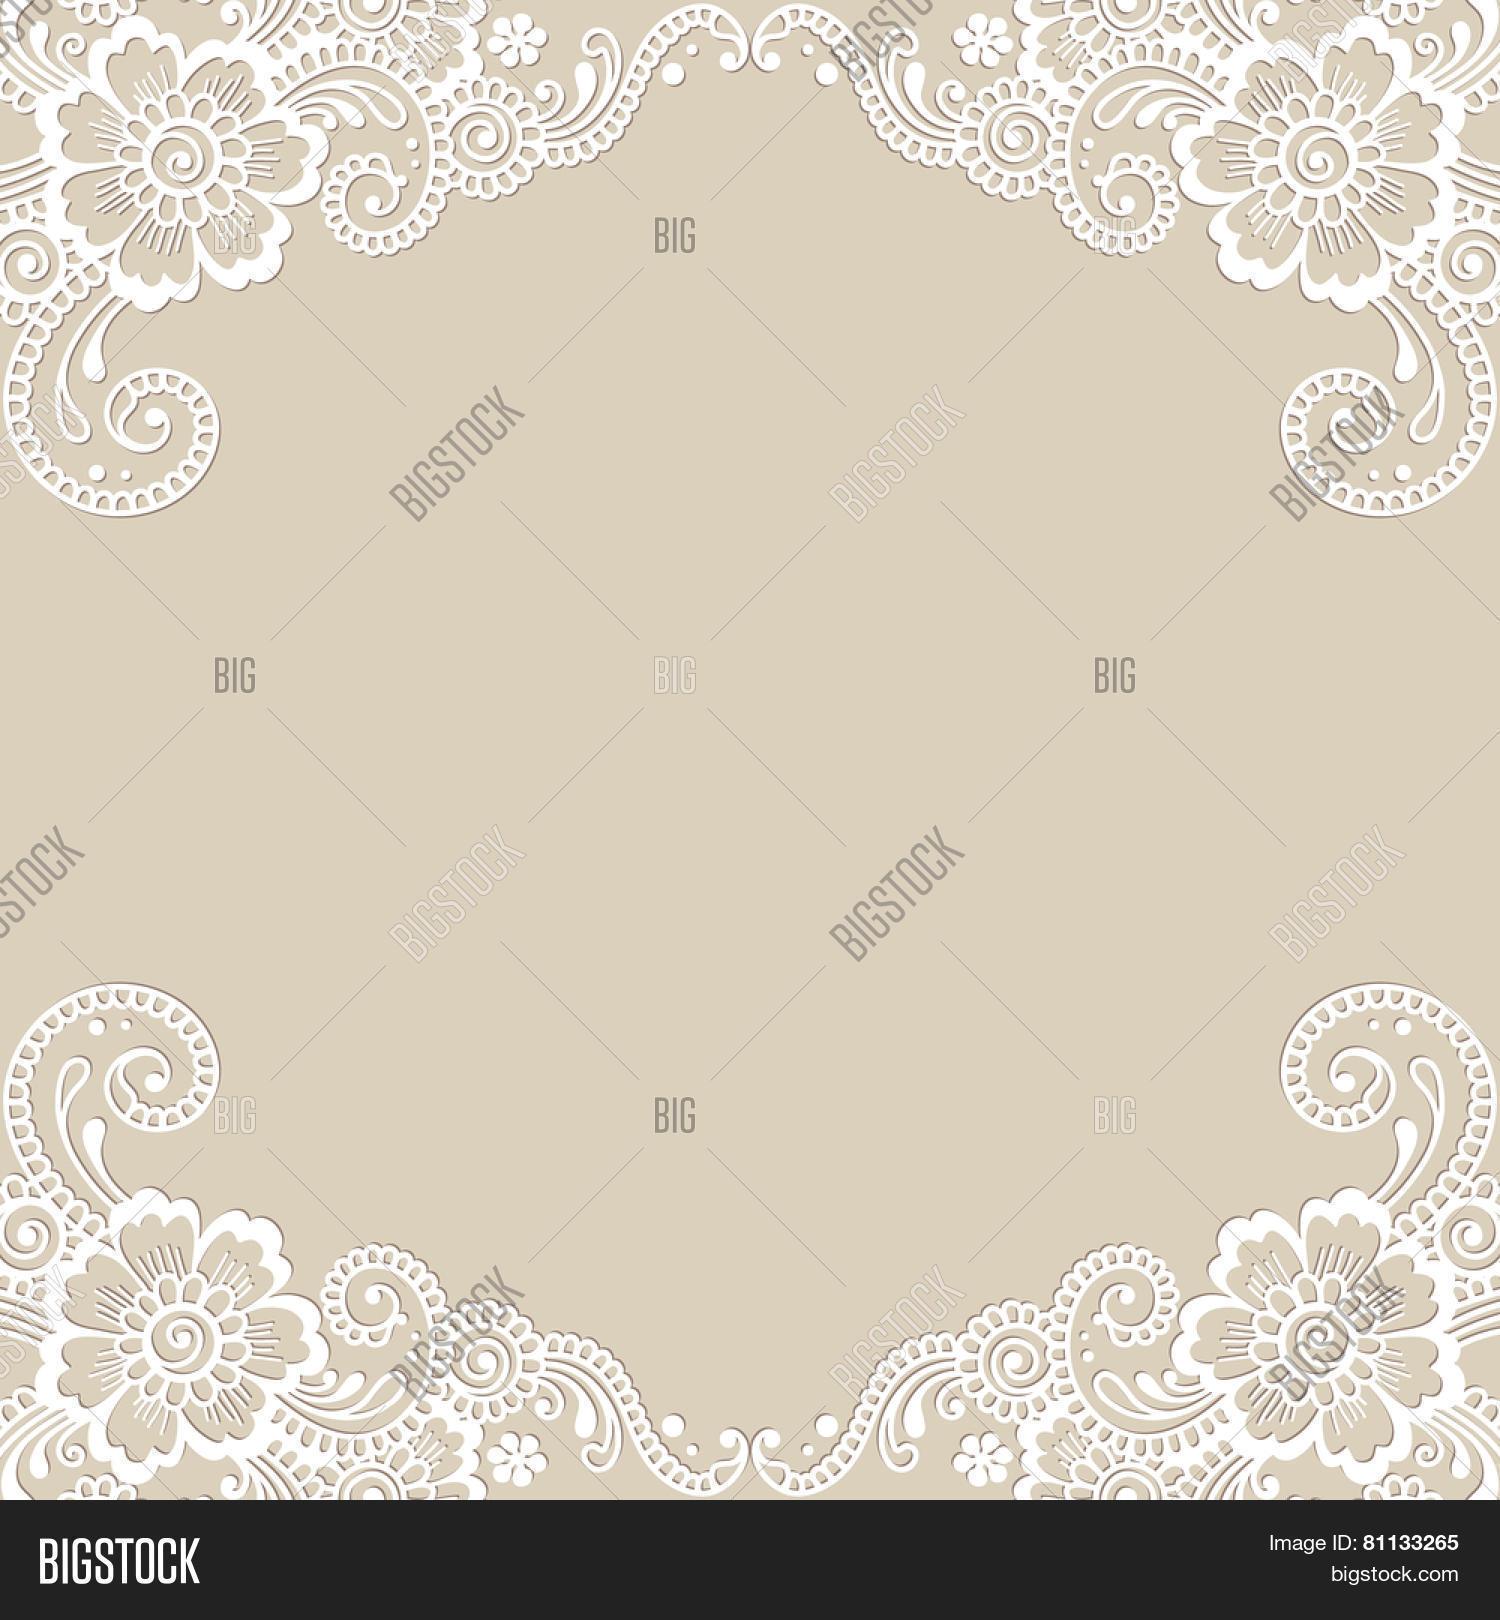 White Flower Frame Vector Photo Free Trial Bigstock